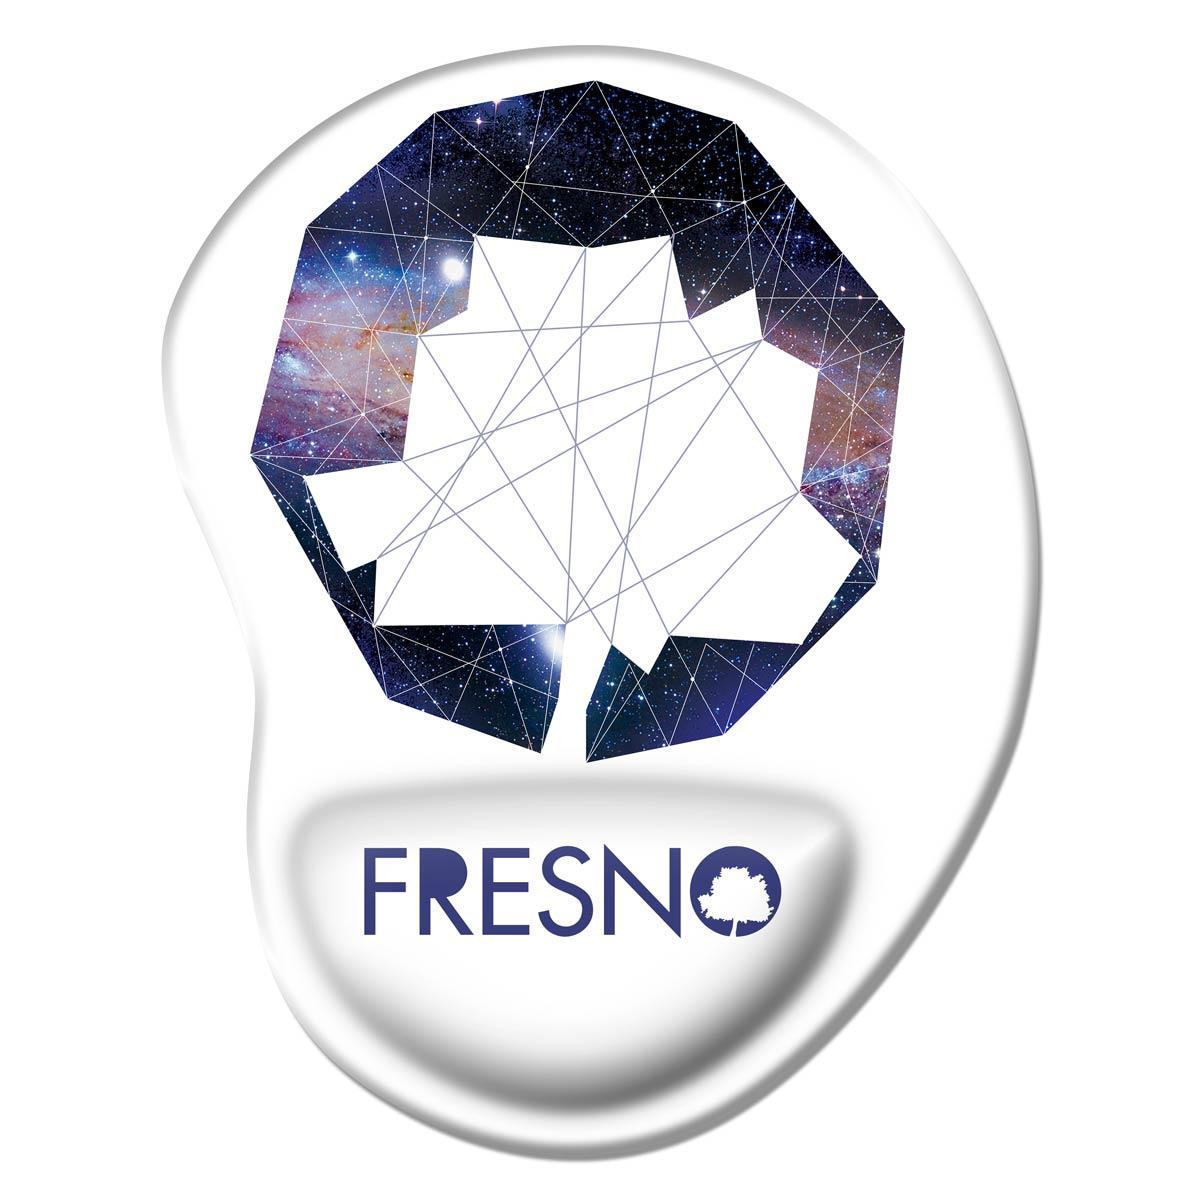 Mousepad Fresno Logo Galaxias